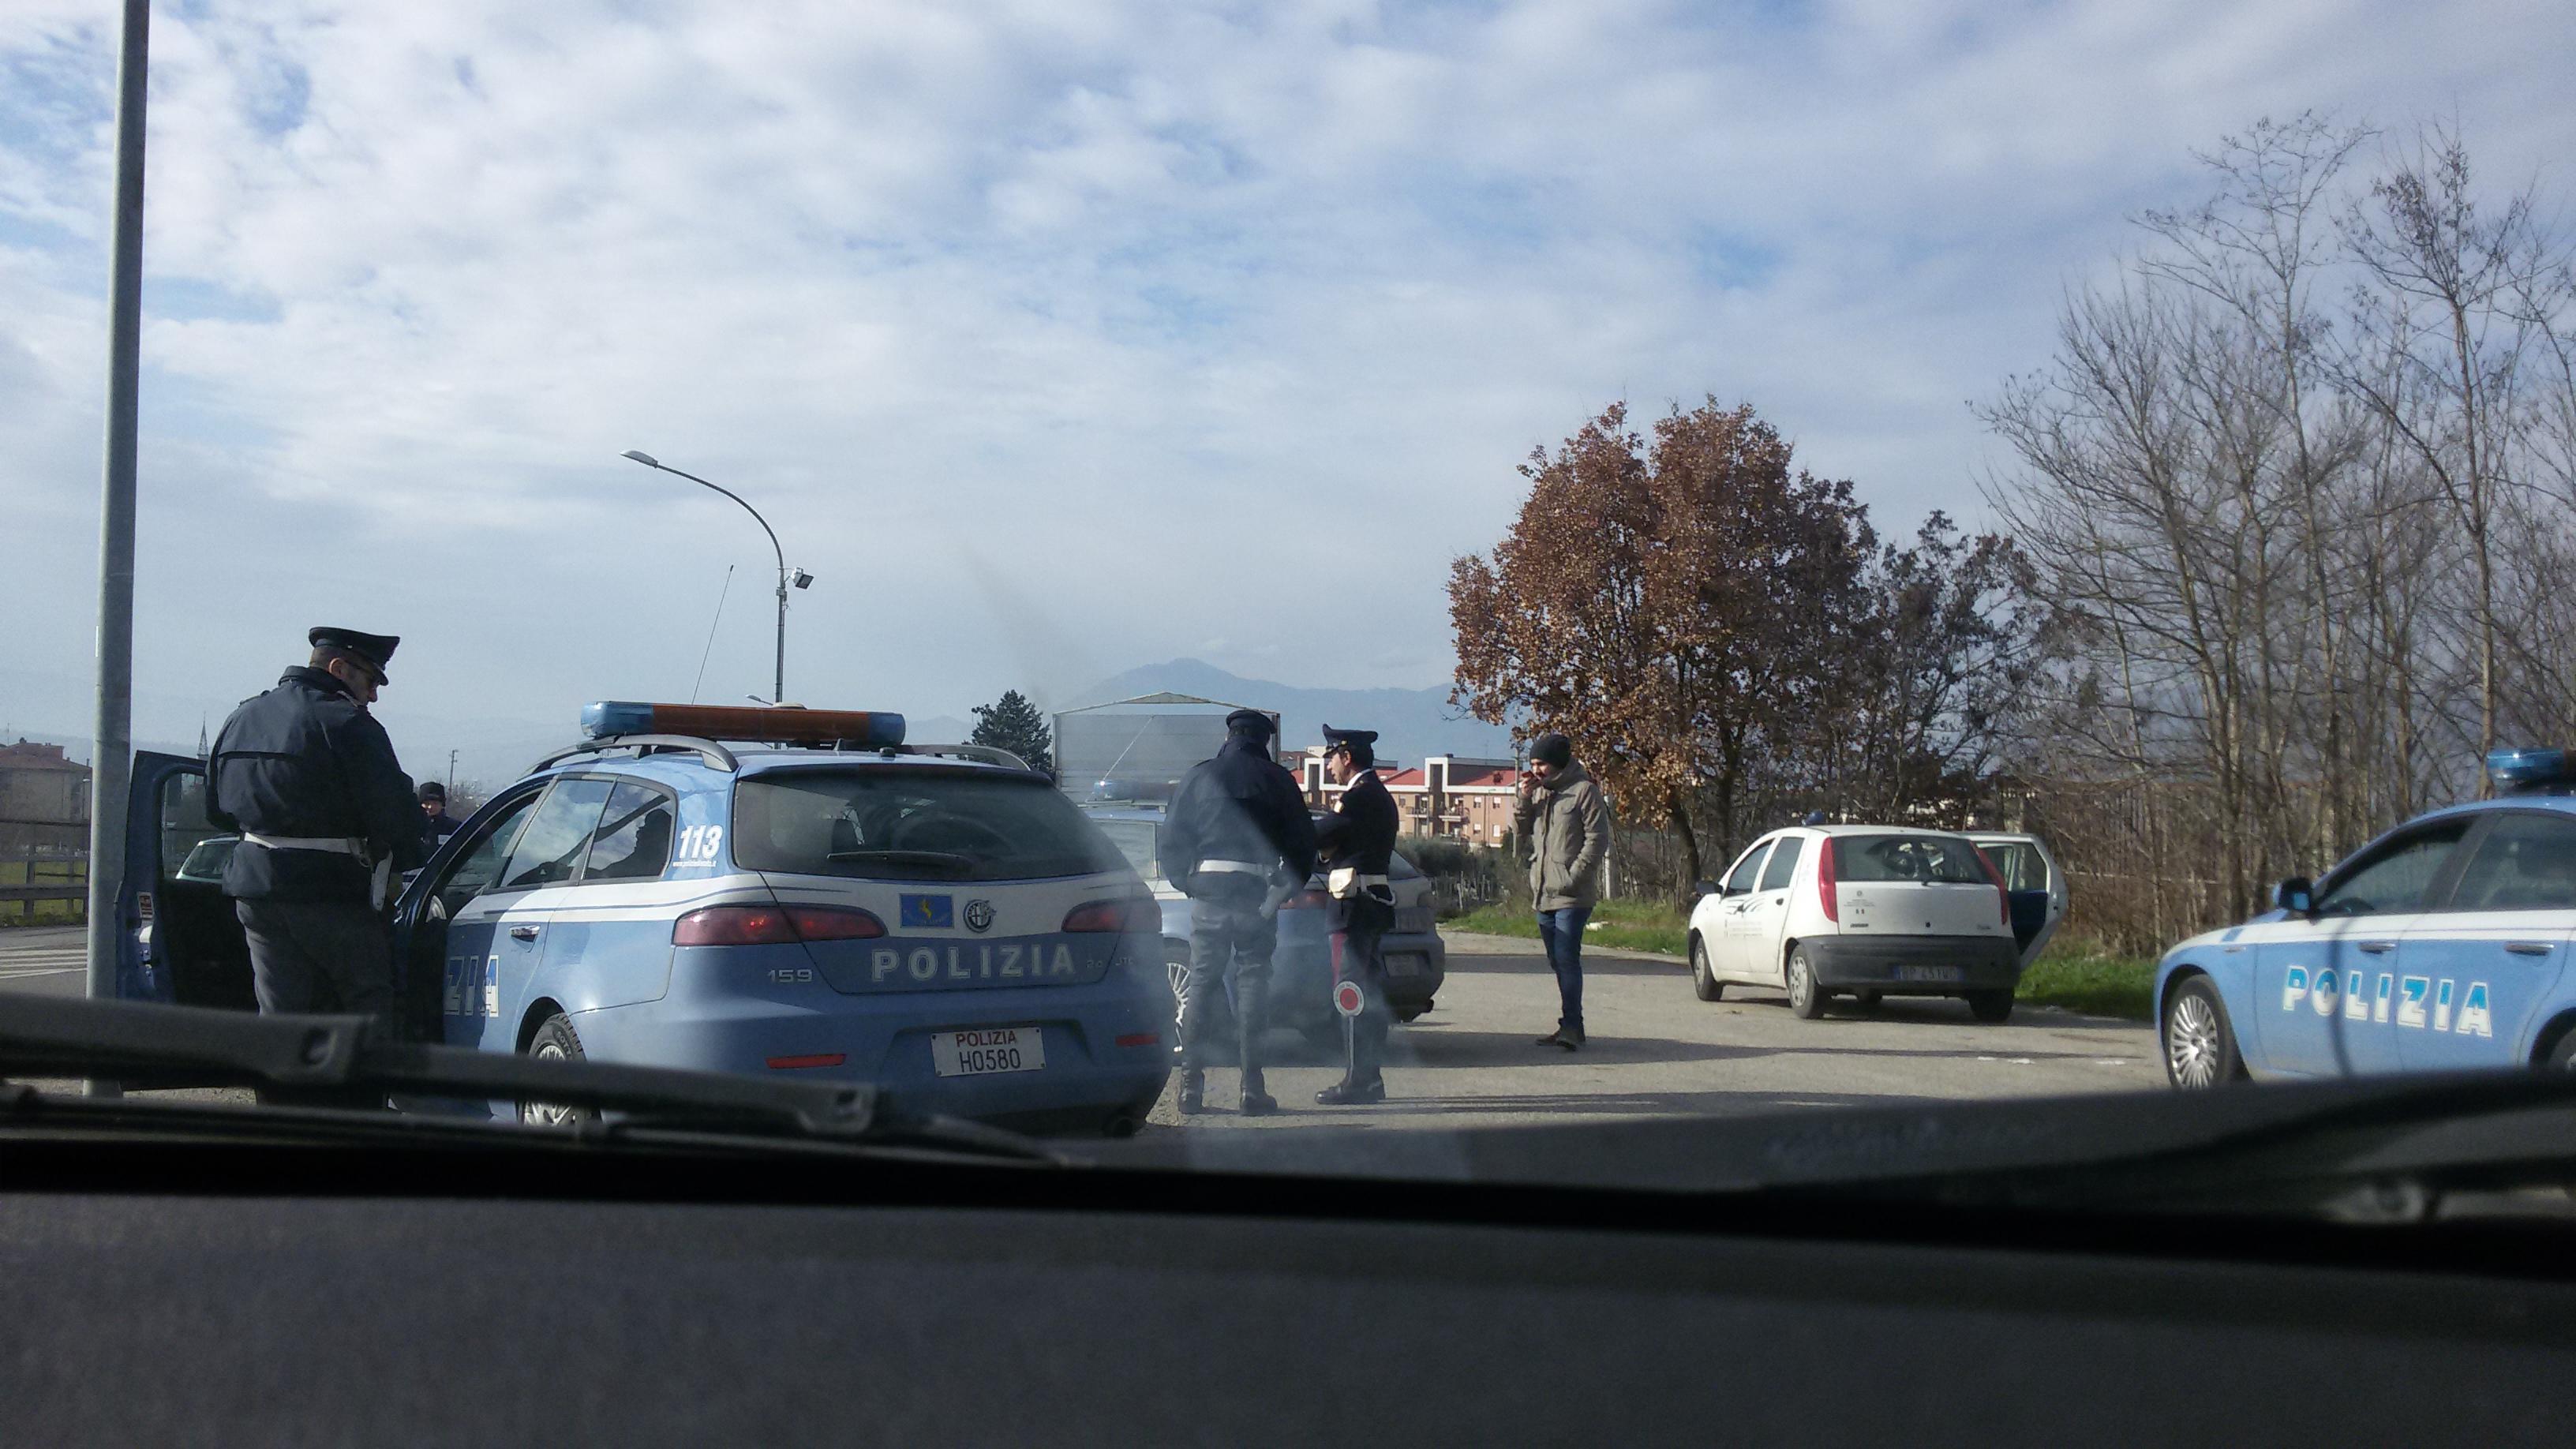 Polizia Stradale, bilancio estivo